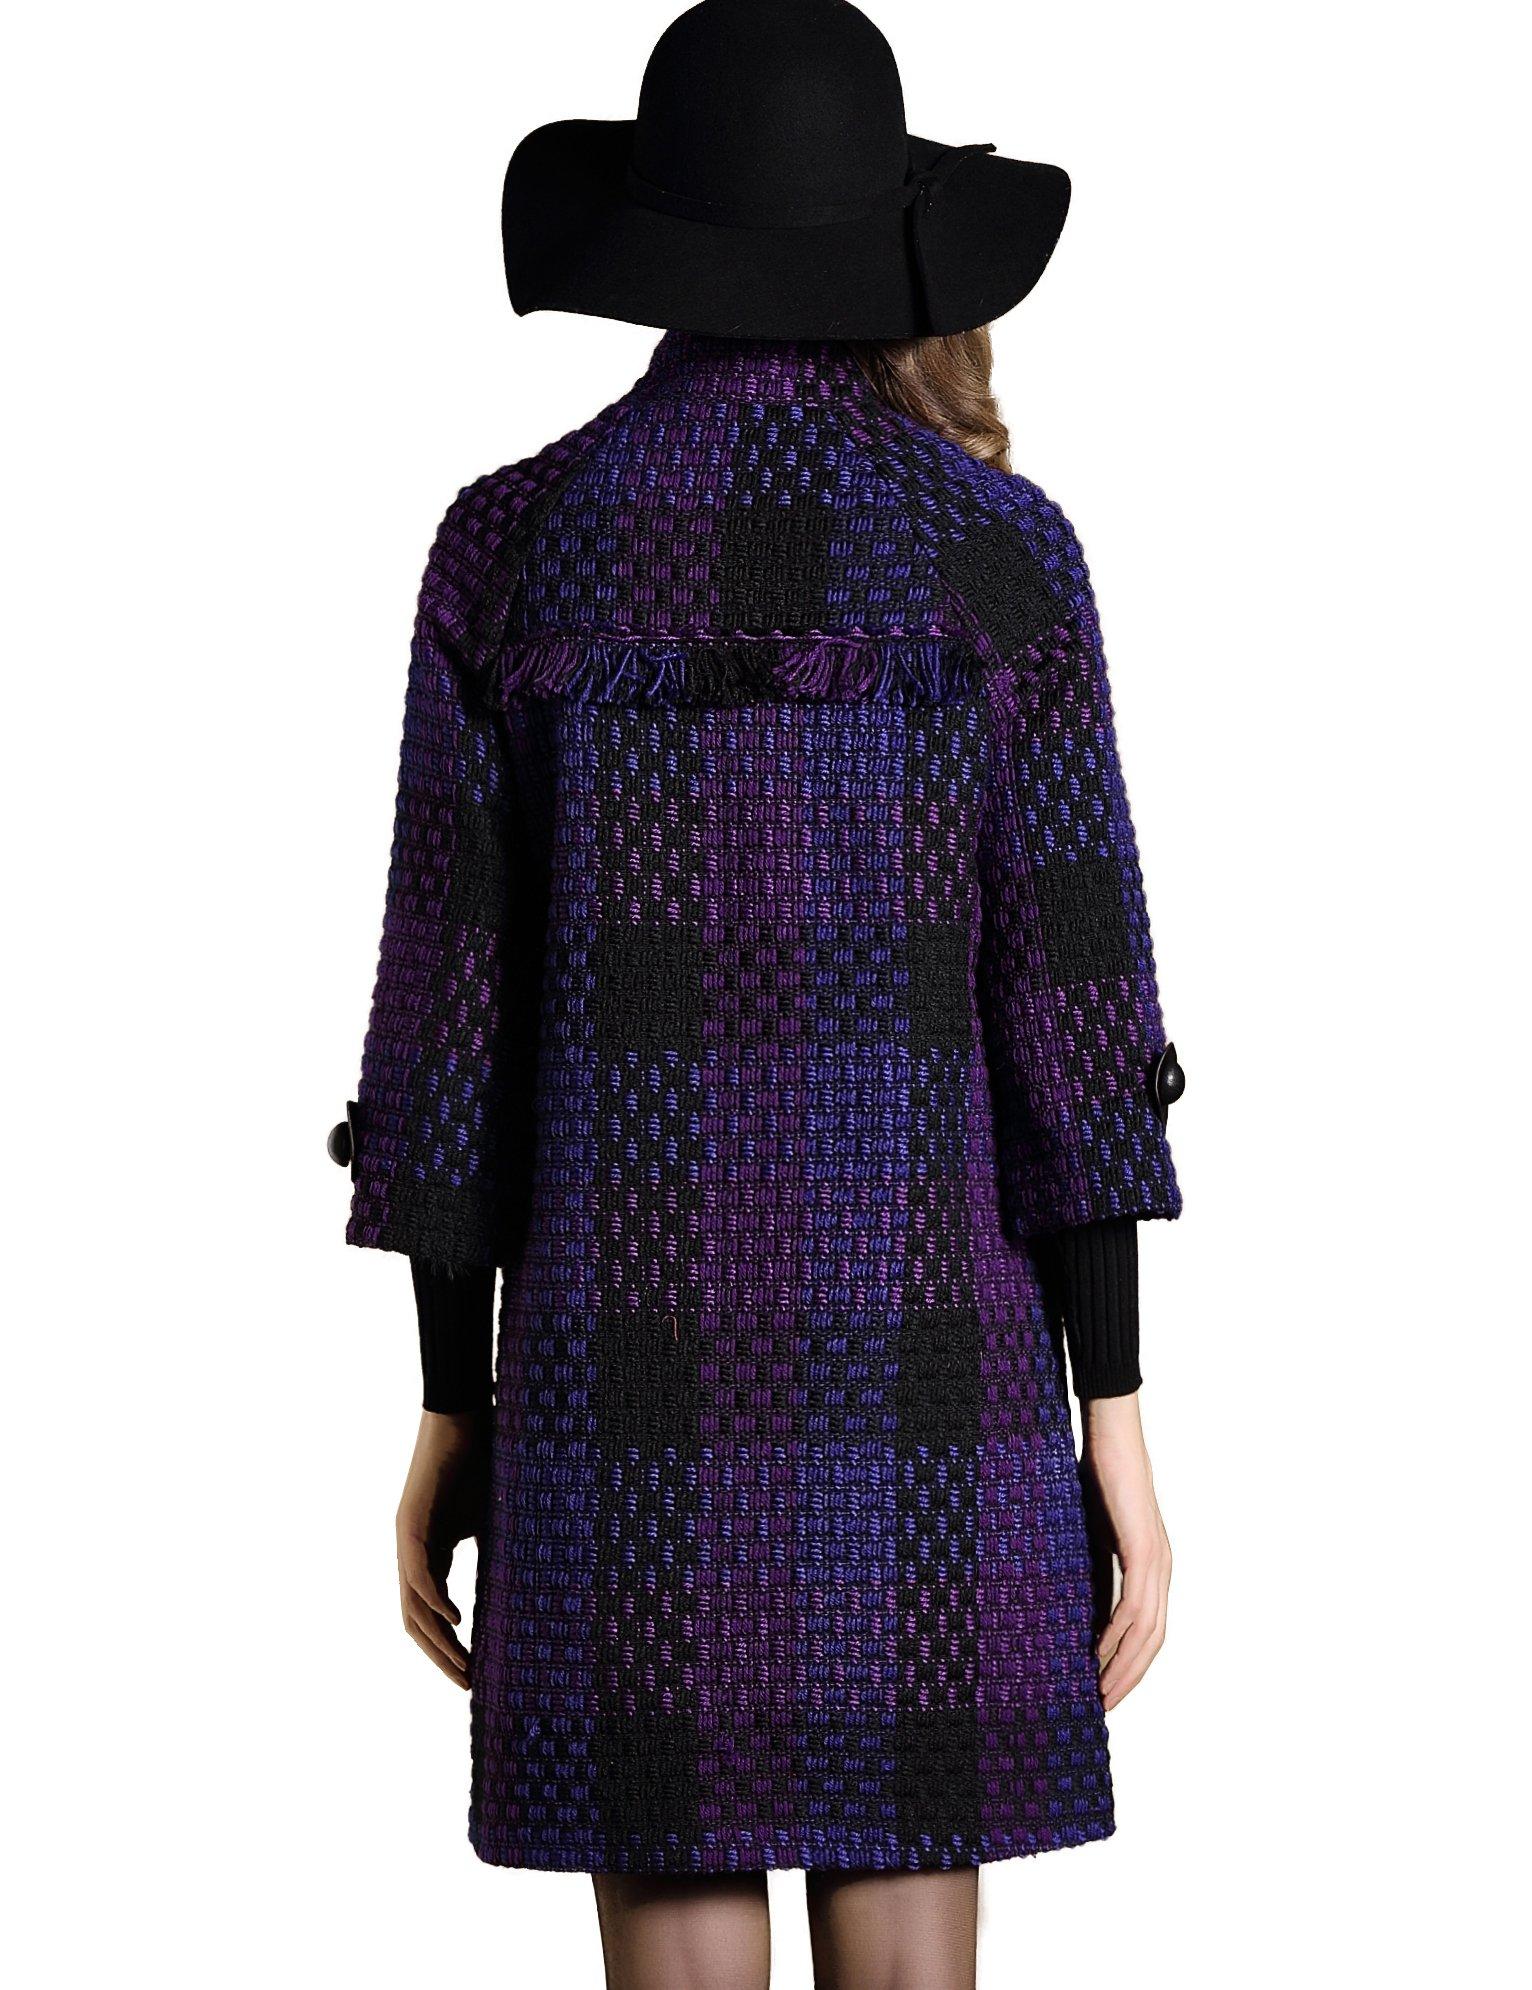 DanMunier Women's Winter Classic Double-Breasted Coat #4358 (M, Purple) by DanMunier (Image #5)